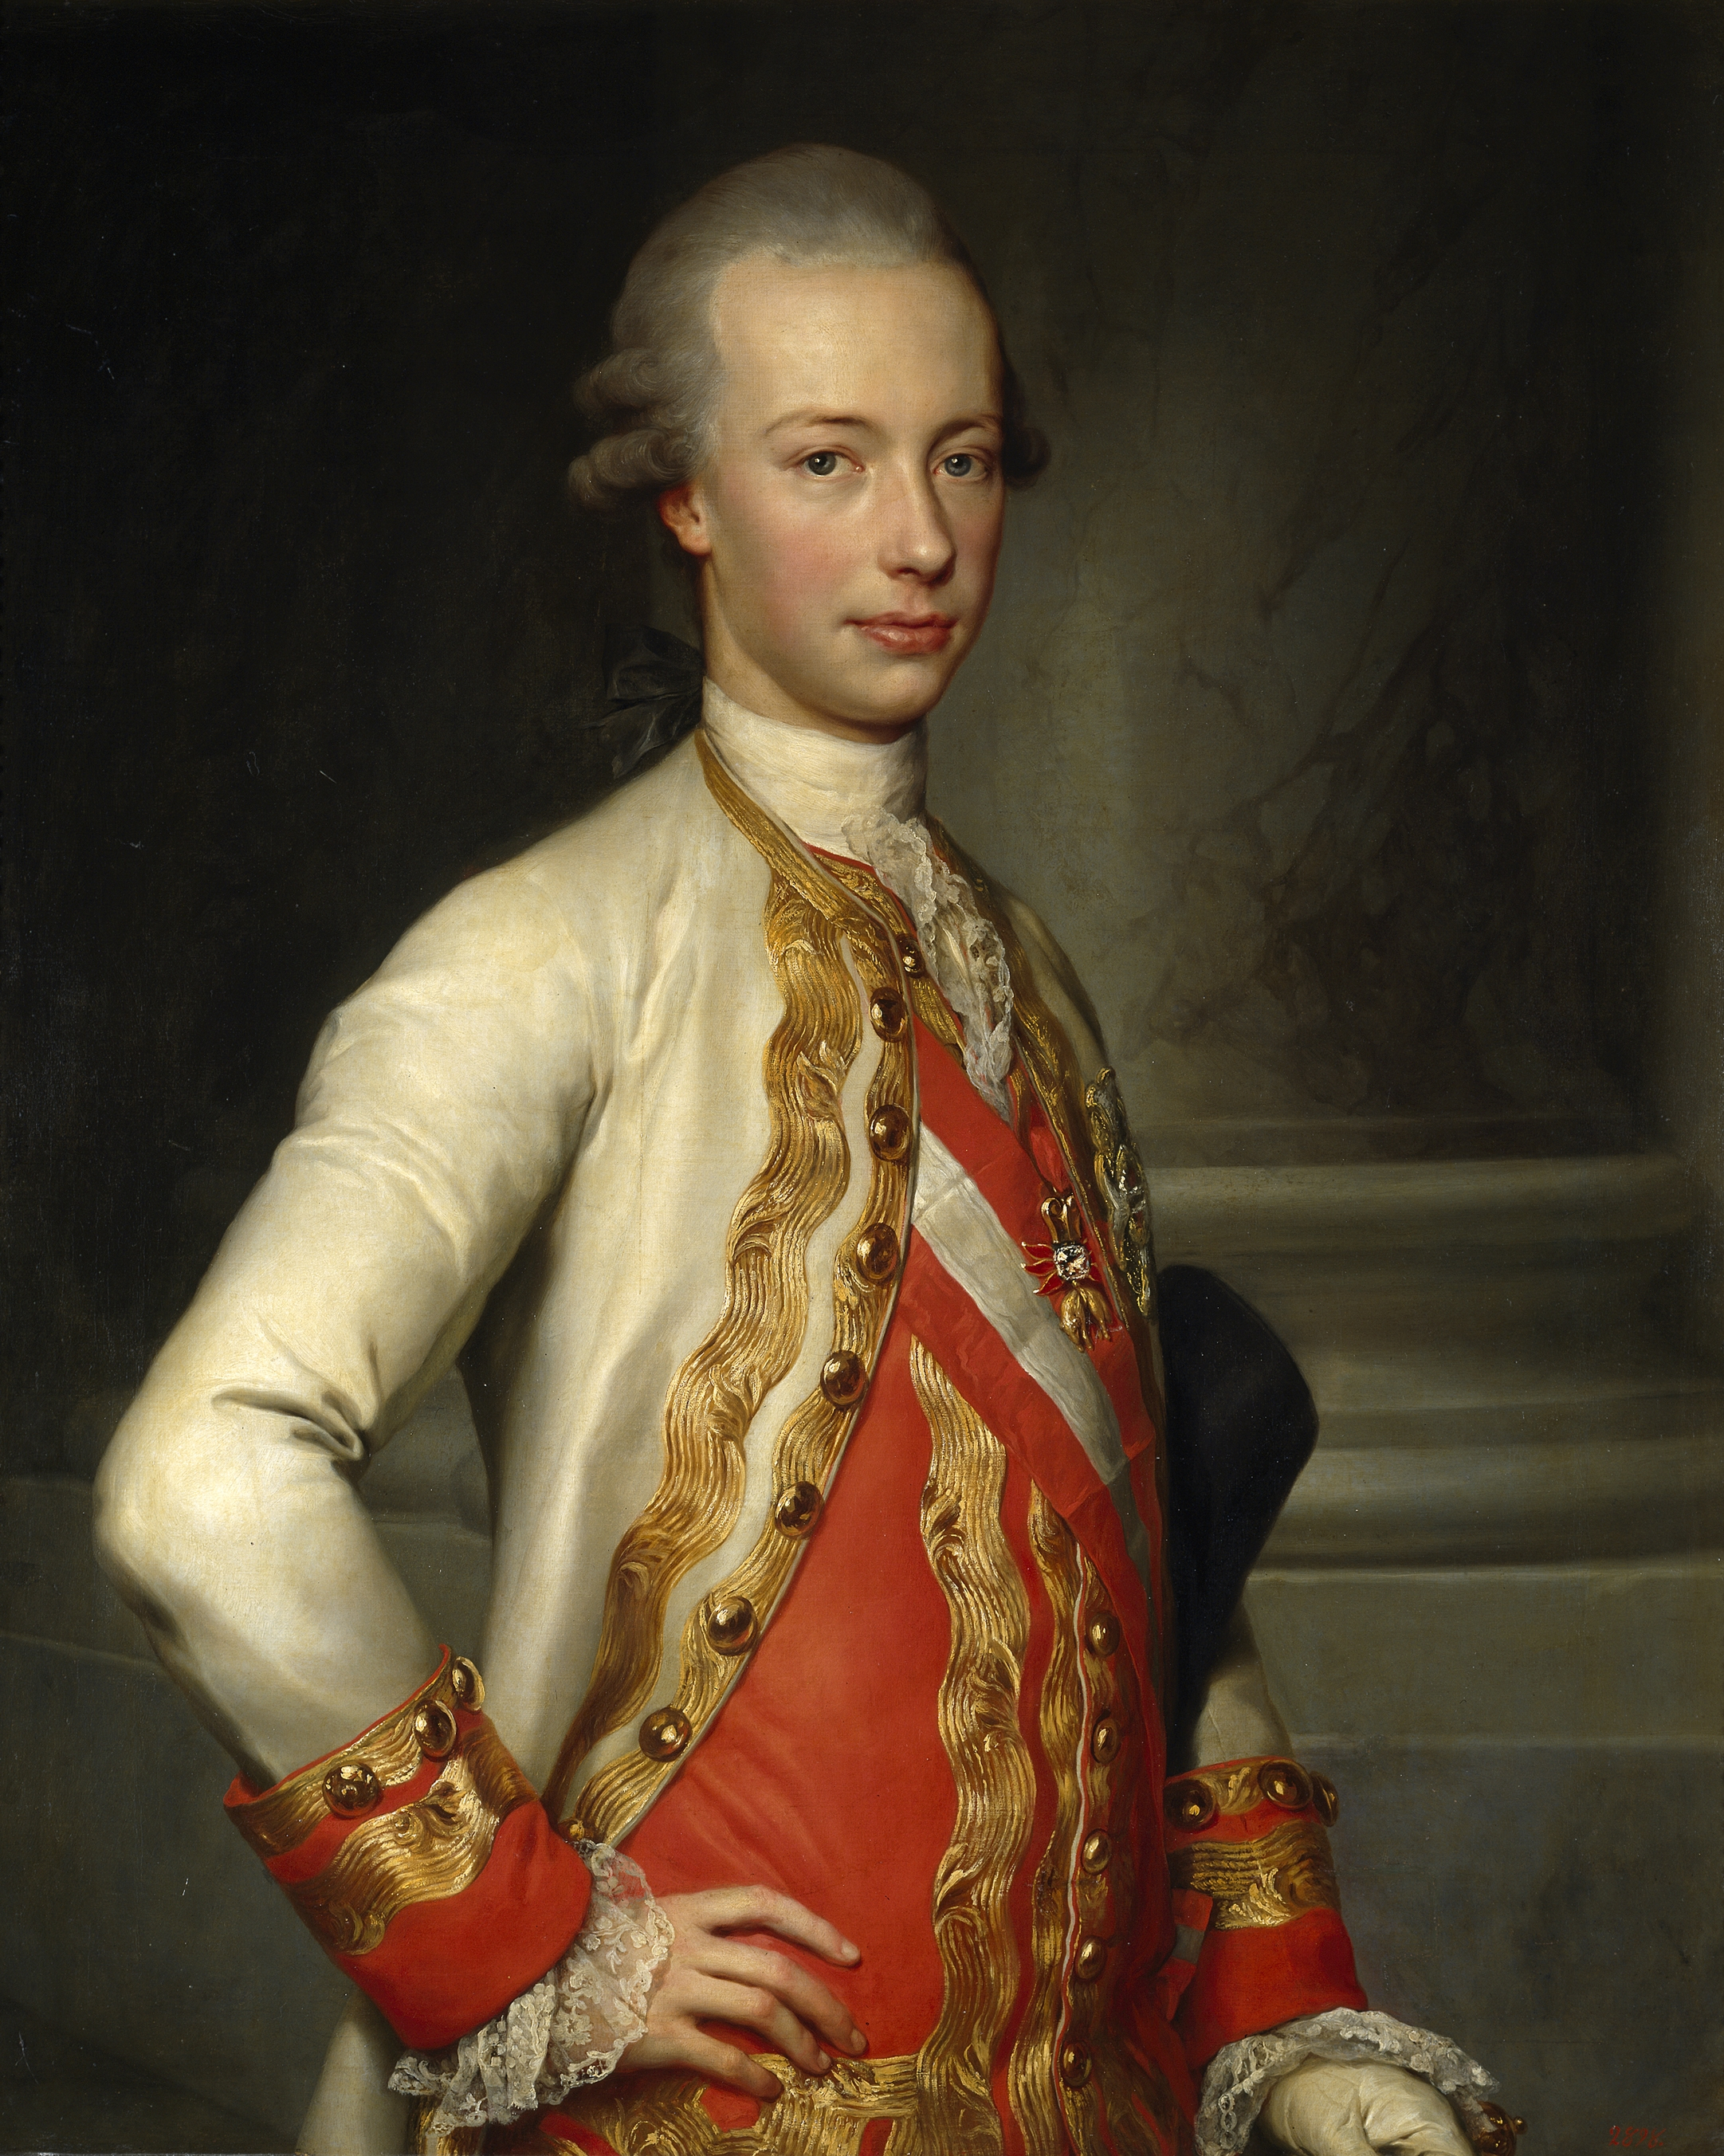 Leopoldo Ii Del Sacro Imperio Romano Germánico Wikipedia La Enciclopedia Libre